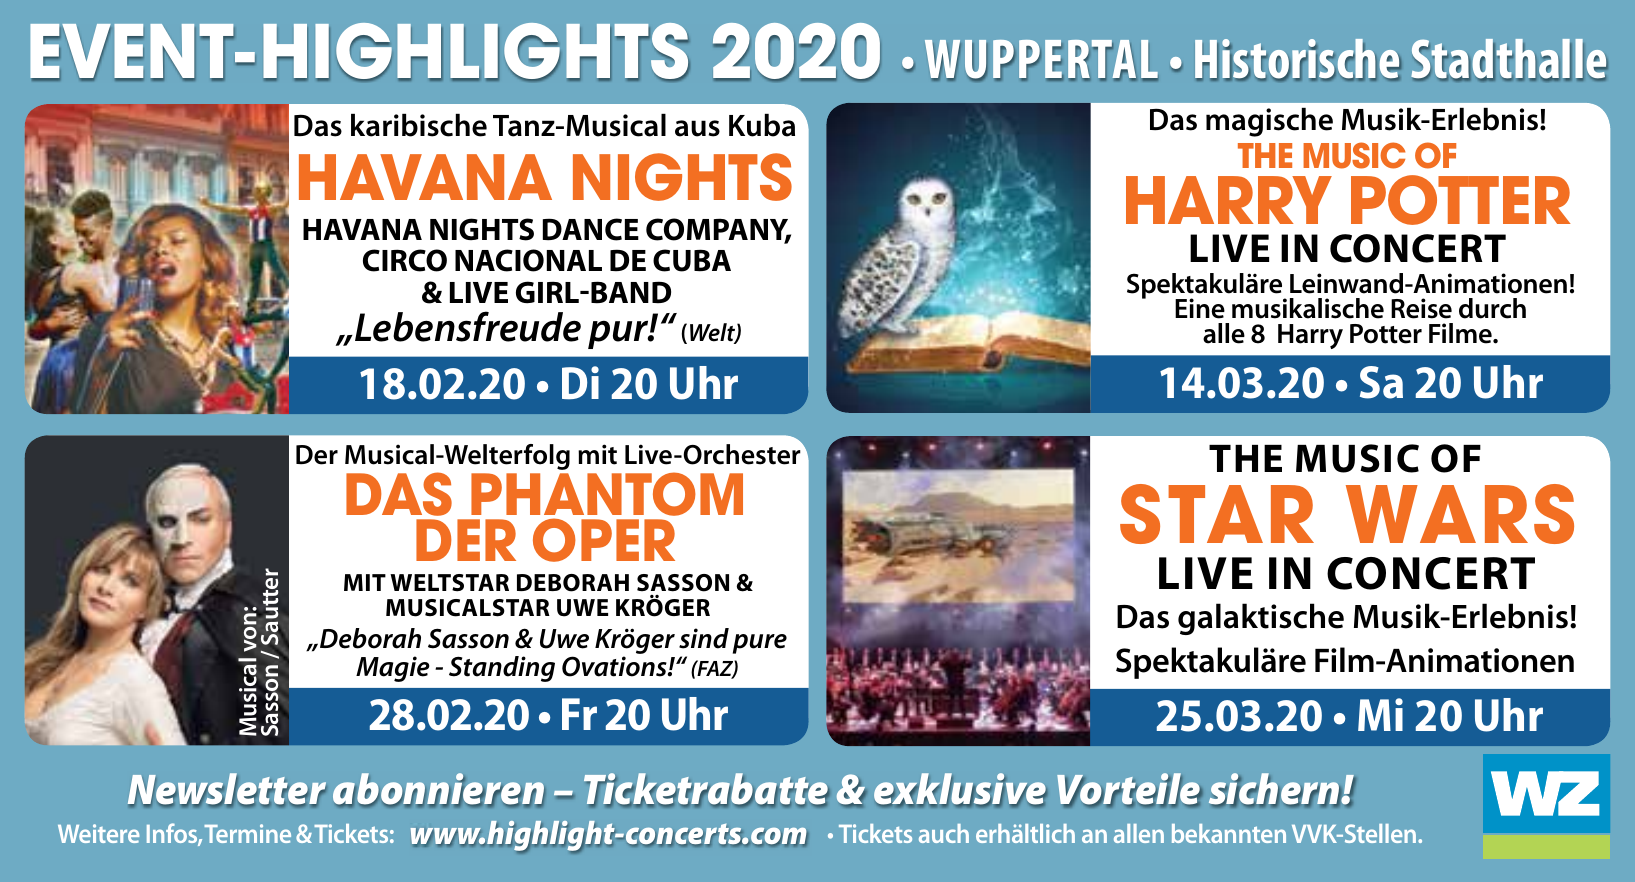 Event-Highlights 2020